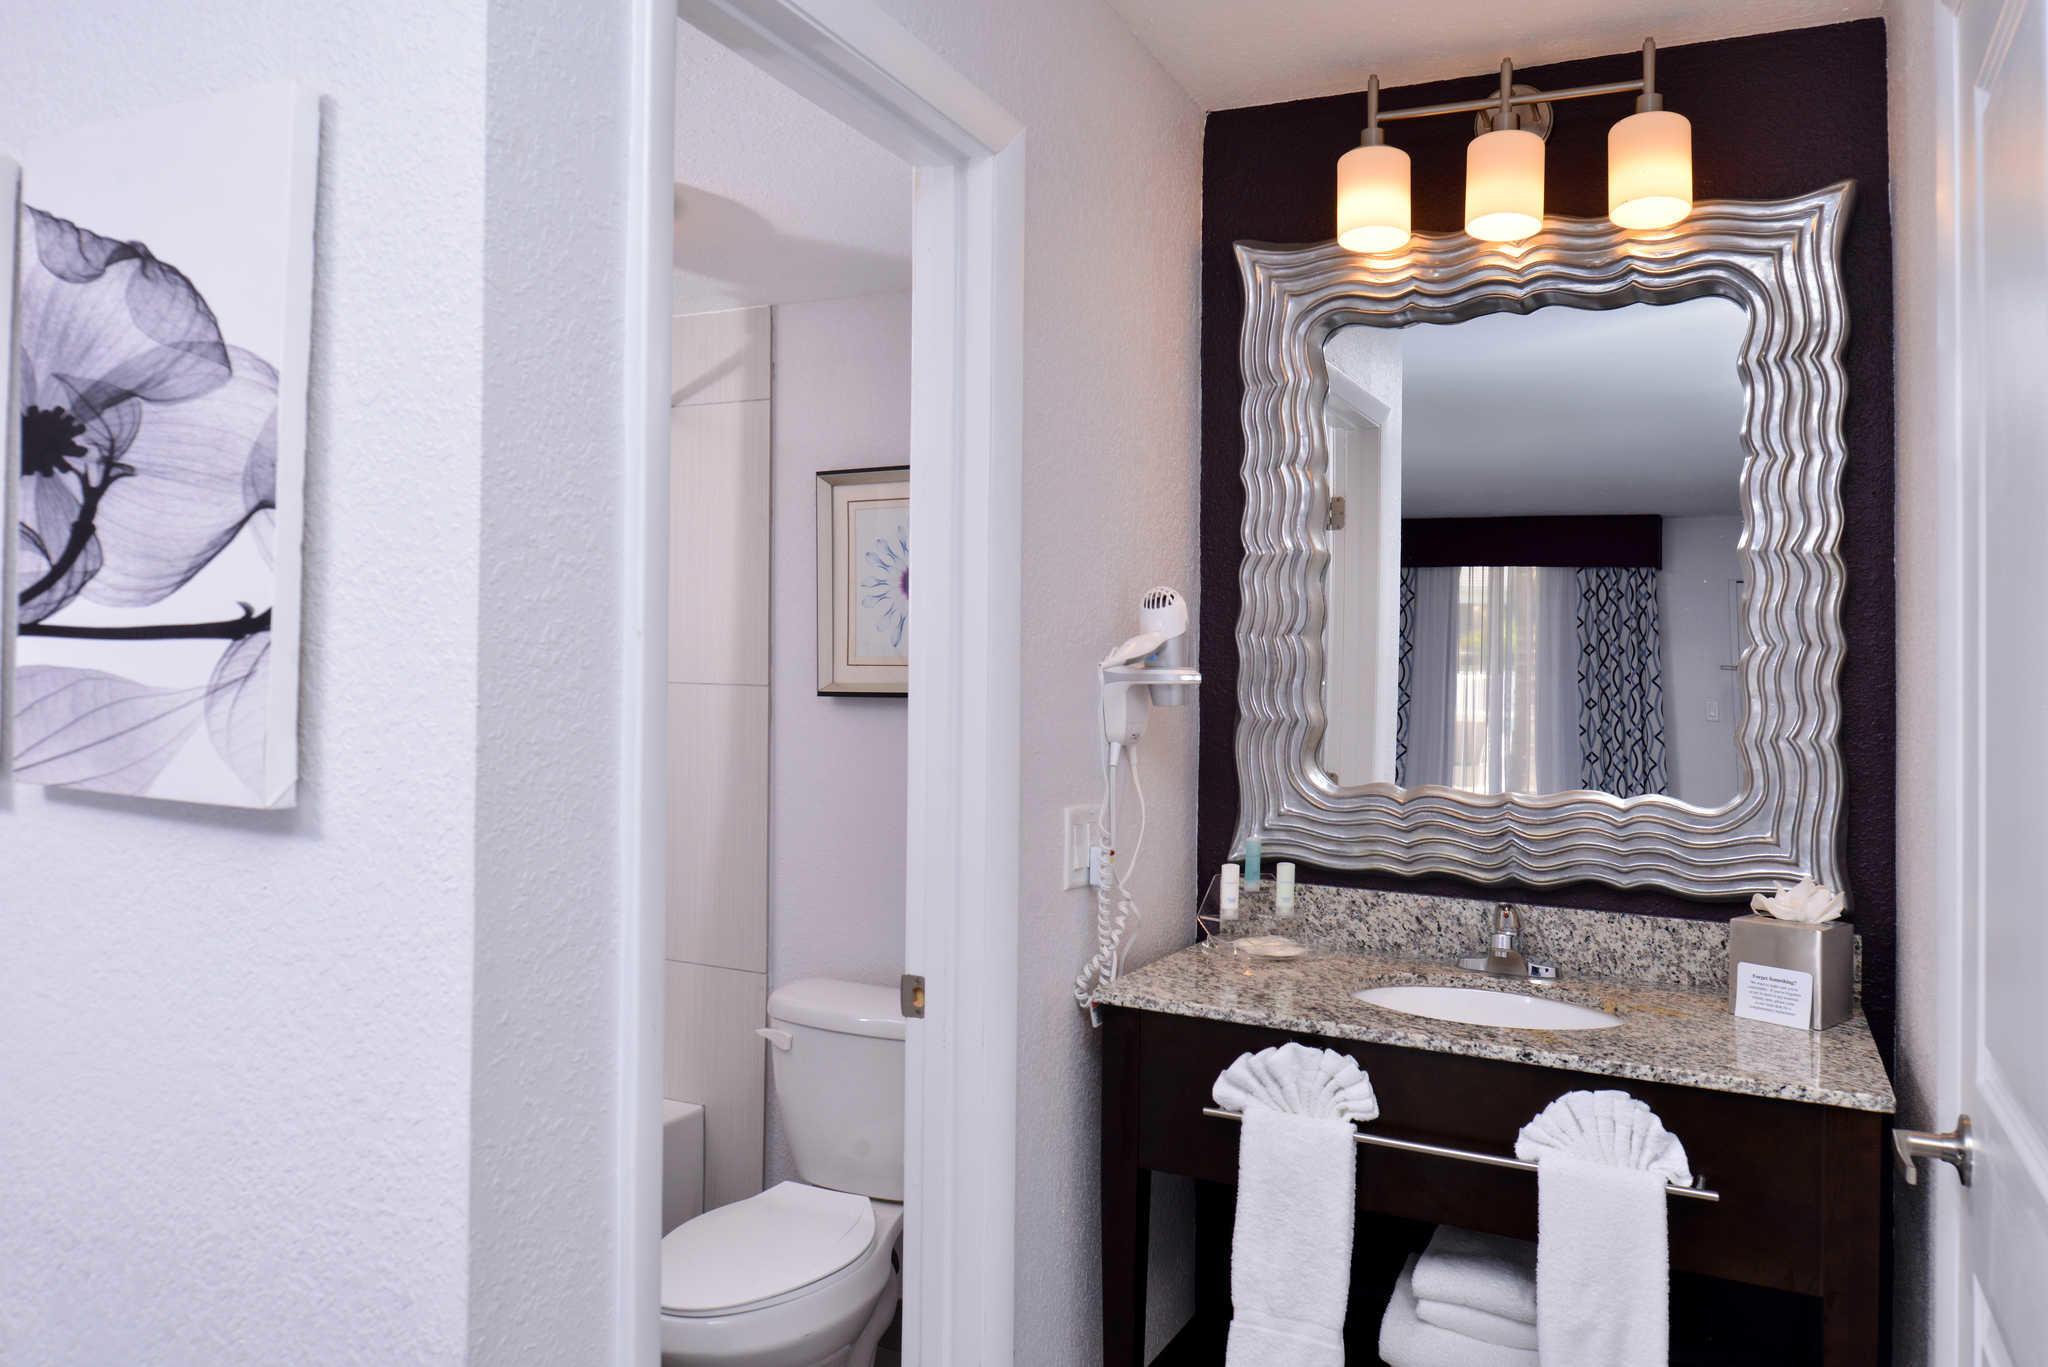 Clarion Inn & Suites Orlando near Theme Parks image 15